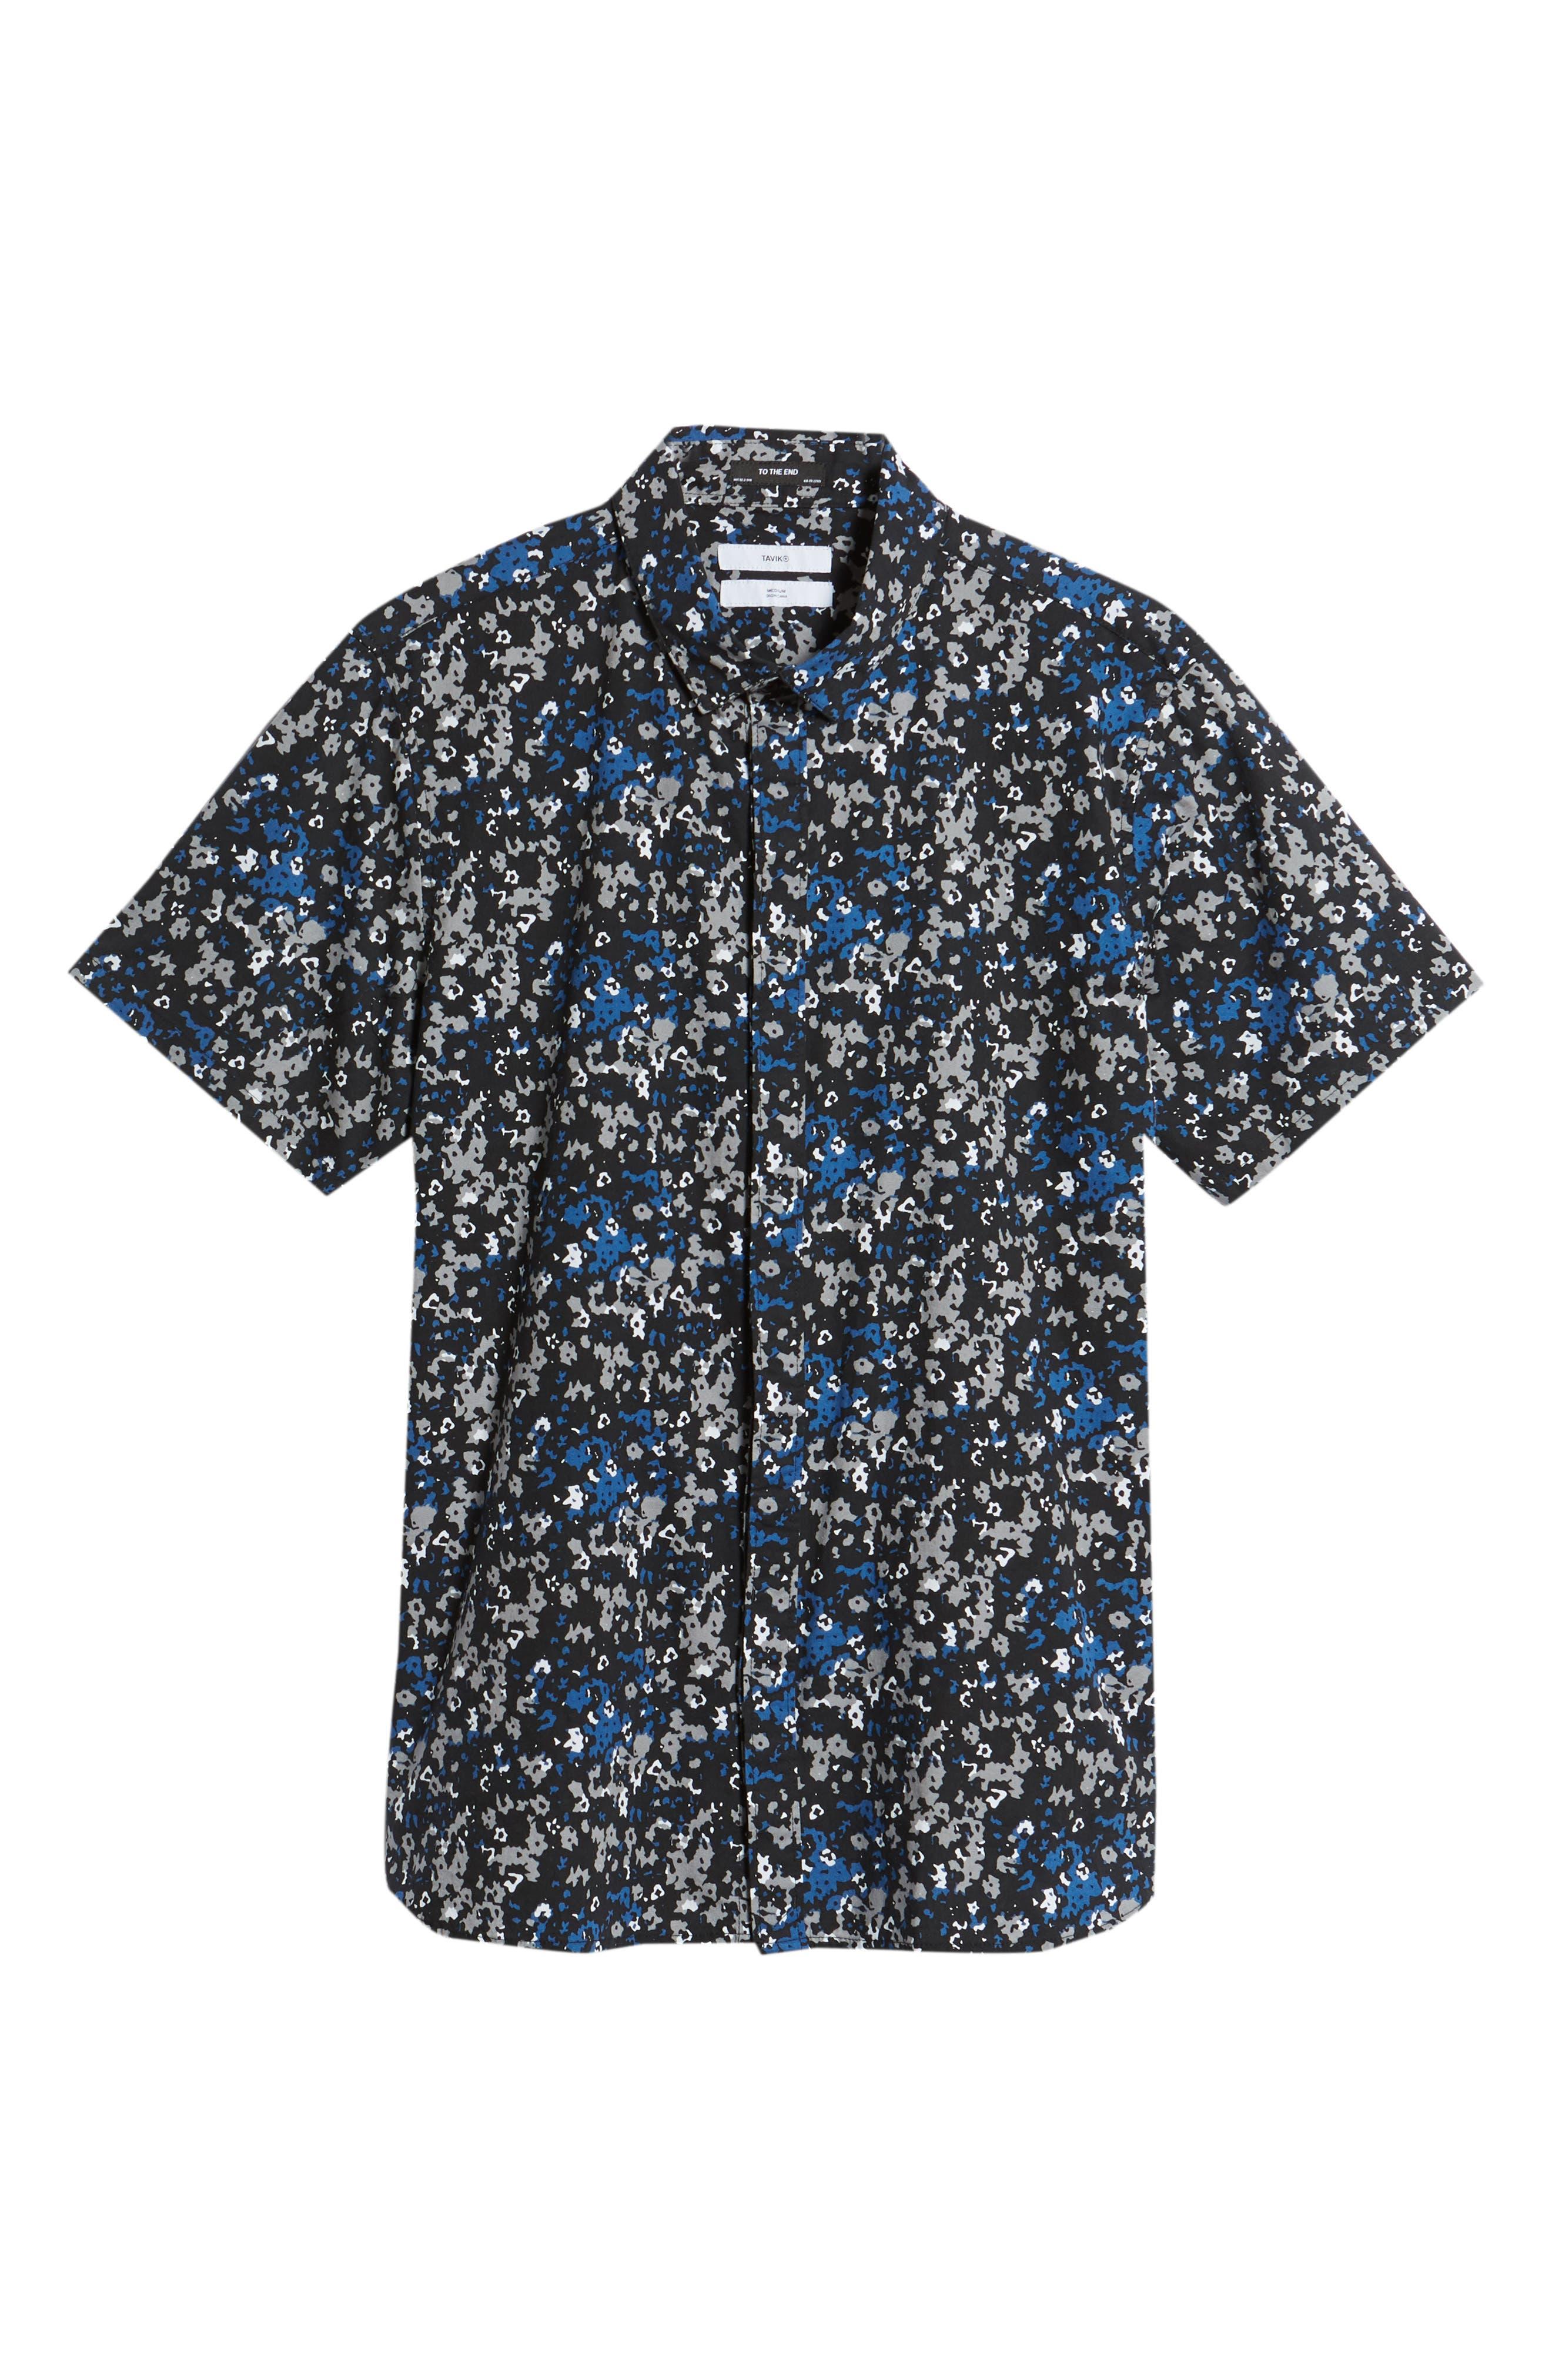 Fowler Woven Shirt,                             Alternate thumbnail 6, color,                             BLACK MICRO FLORAL